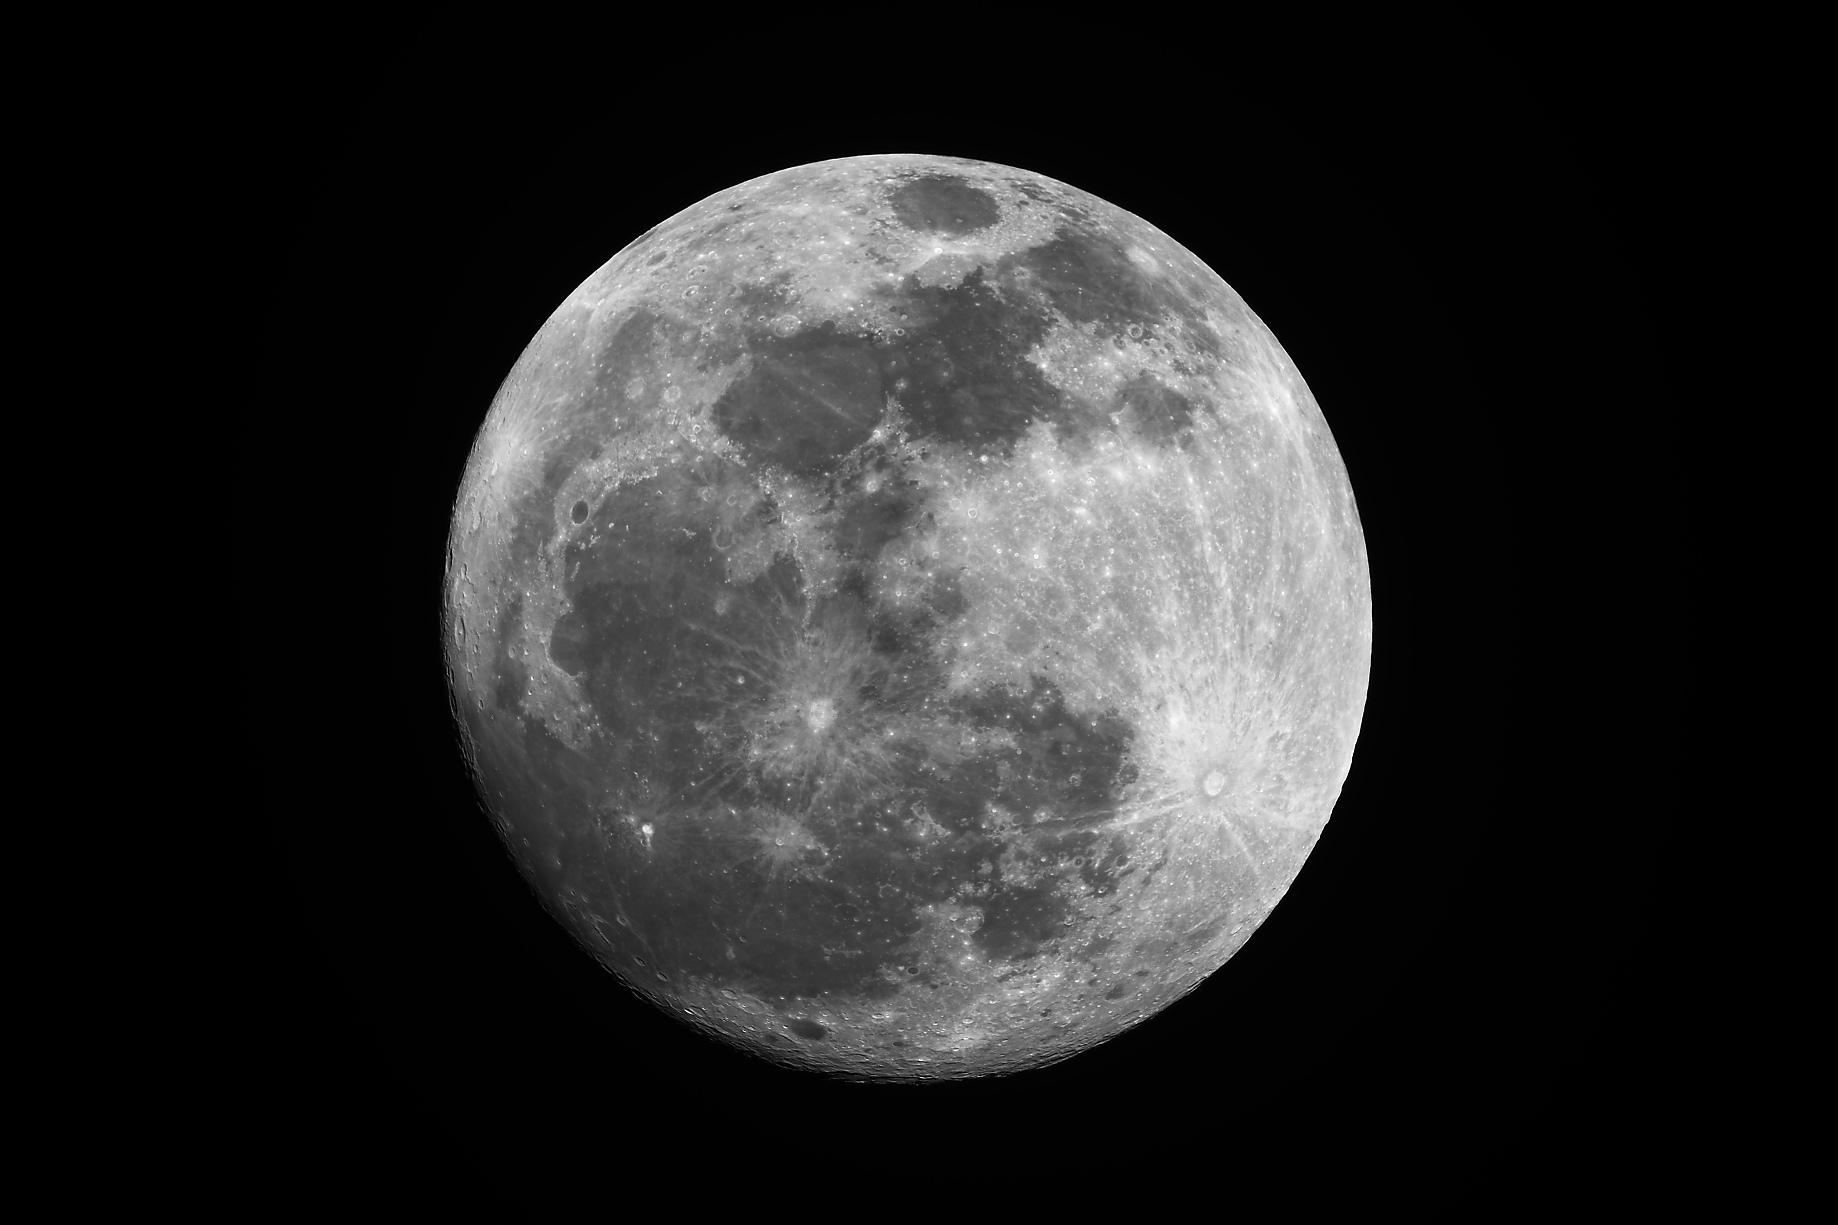 171005 - Lune gibbeuse - Pollux - STL11K